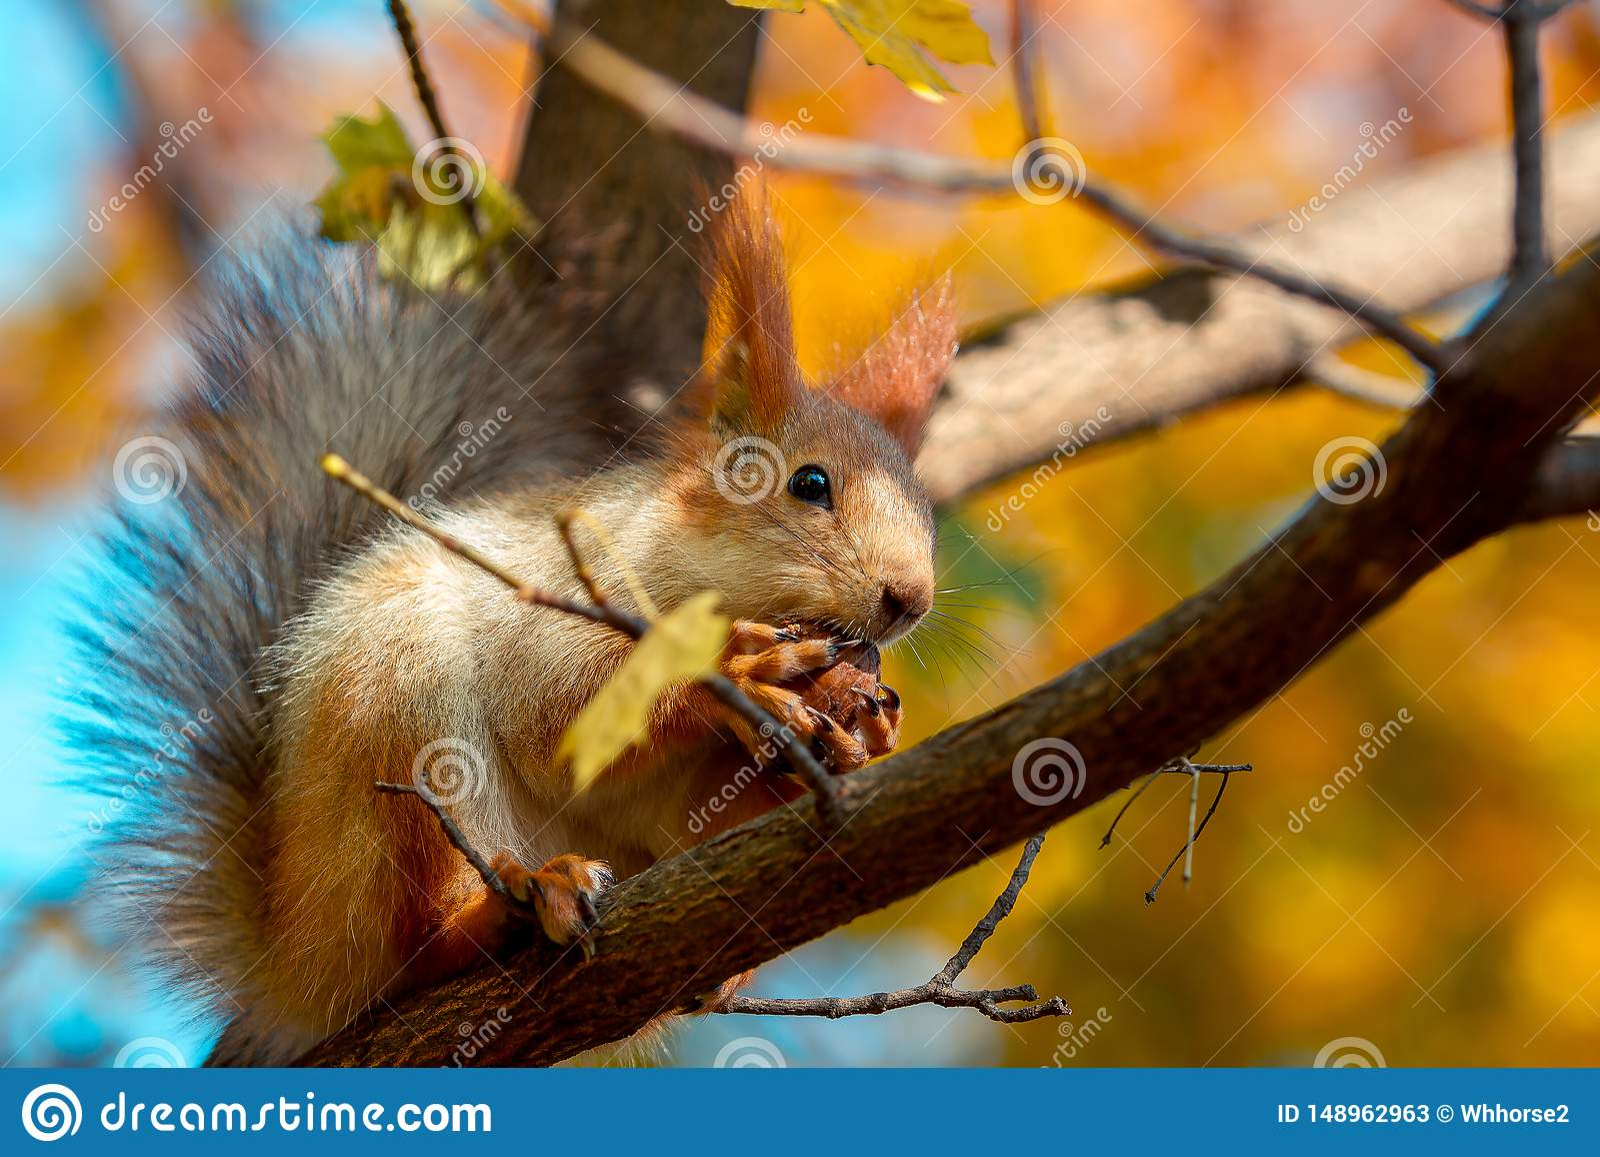 Белка ест грецкий орех на ветви дерева